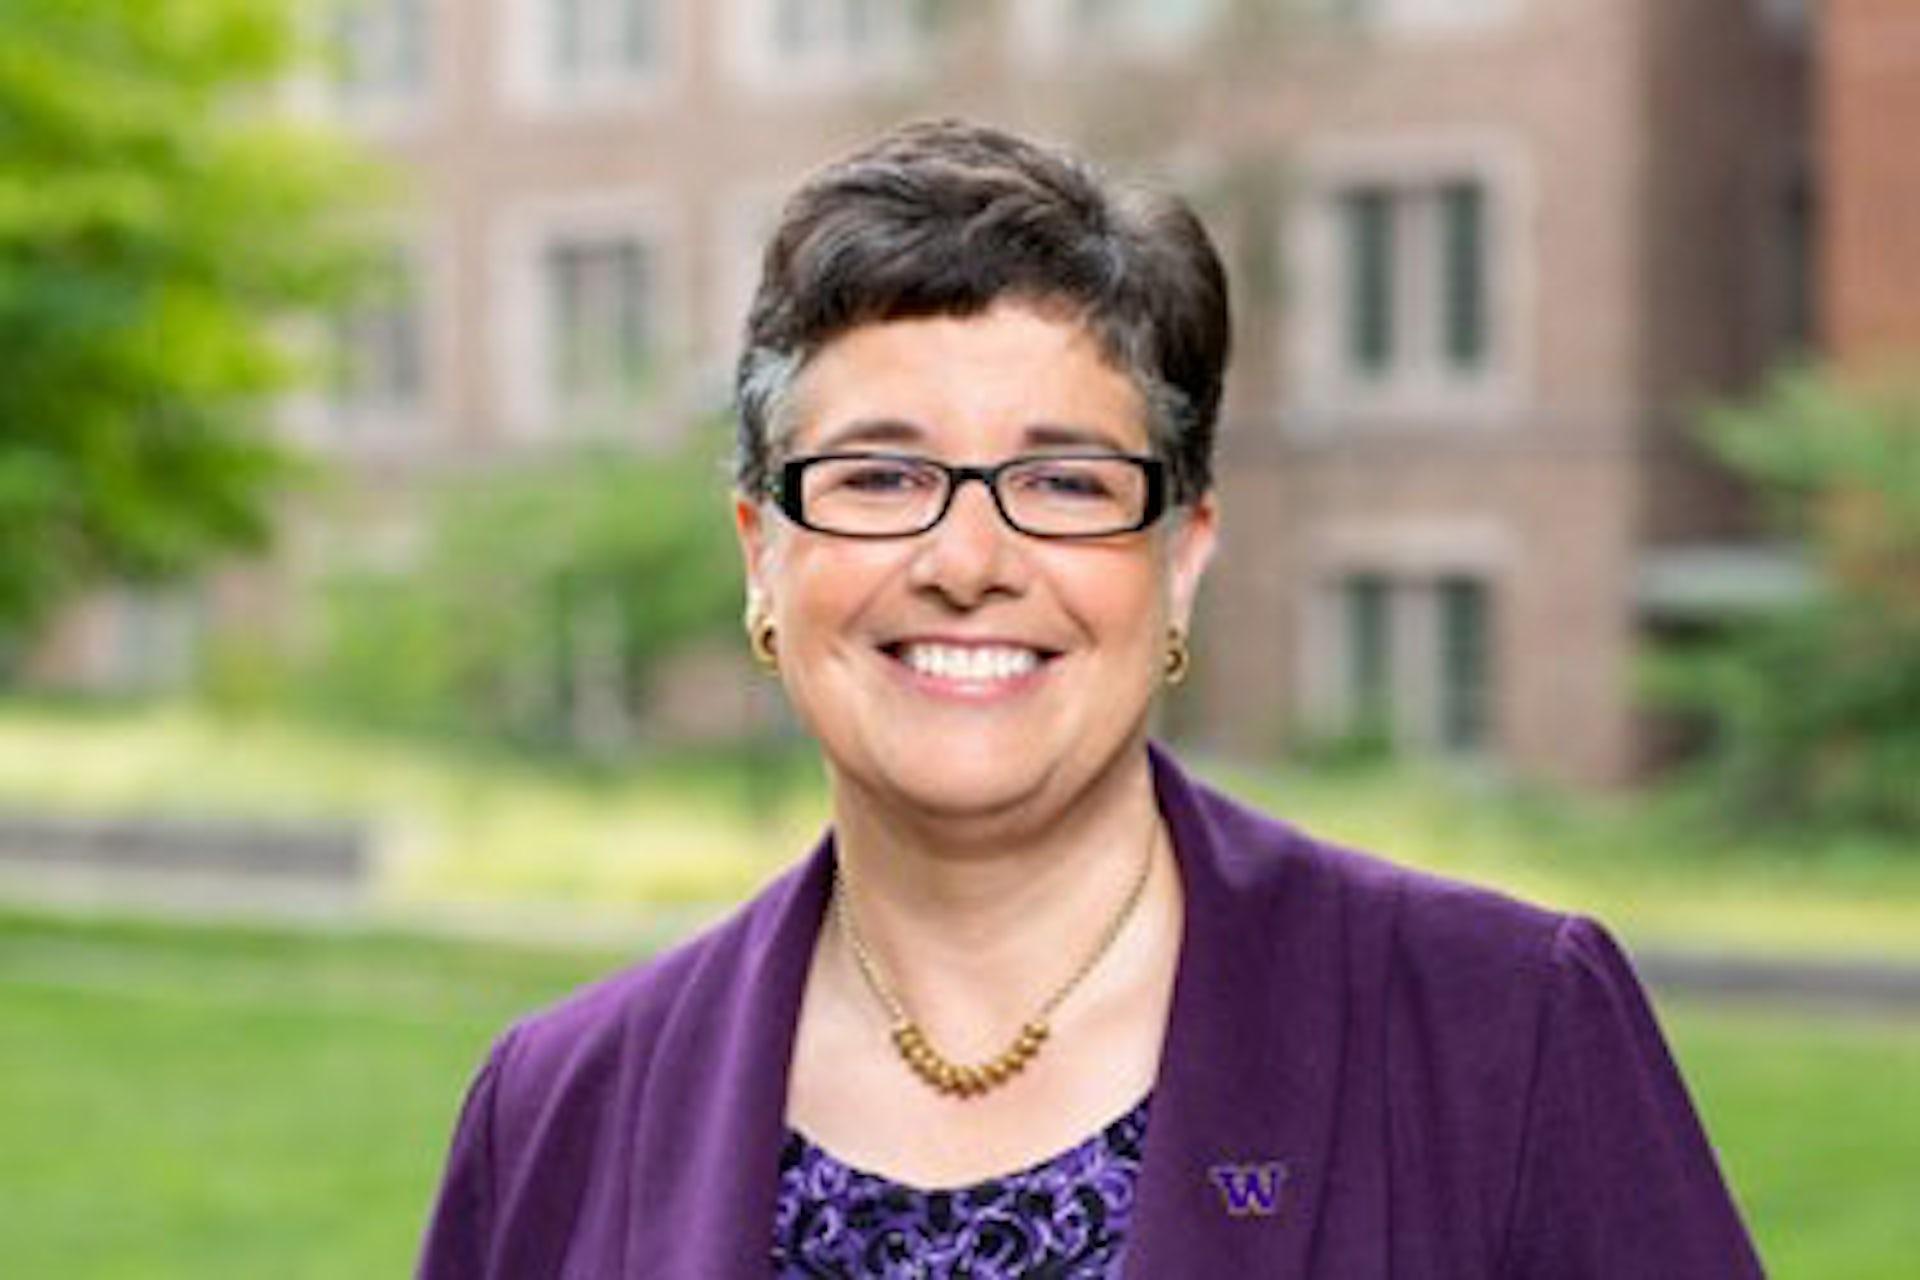 Ana Mari Cauce. University of Washington